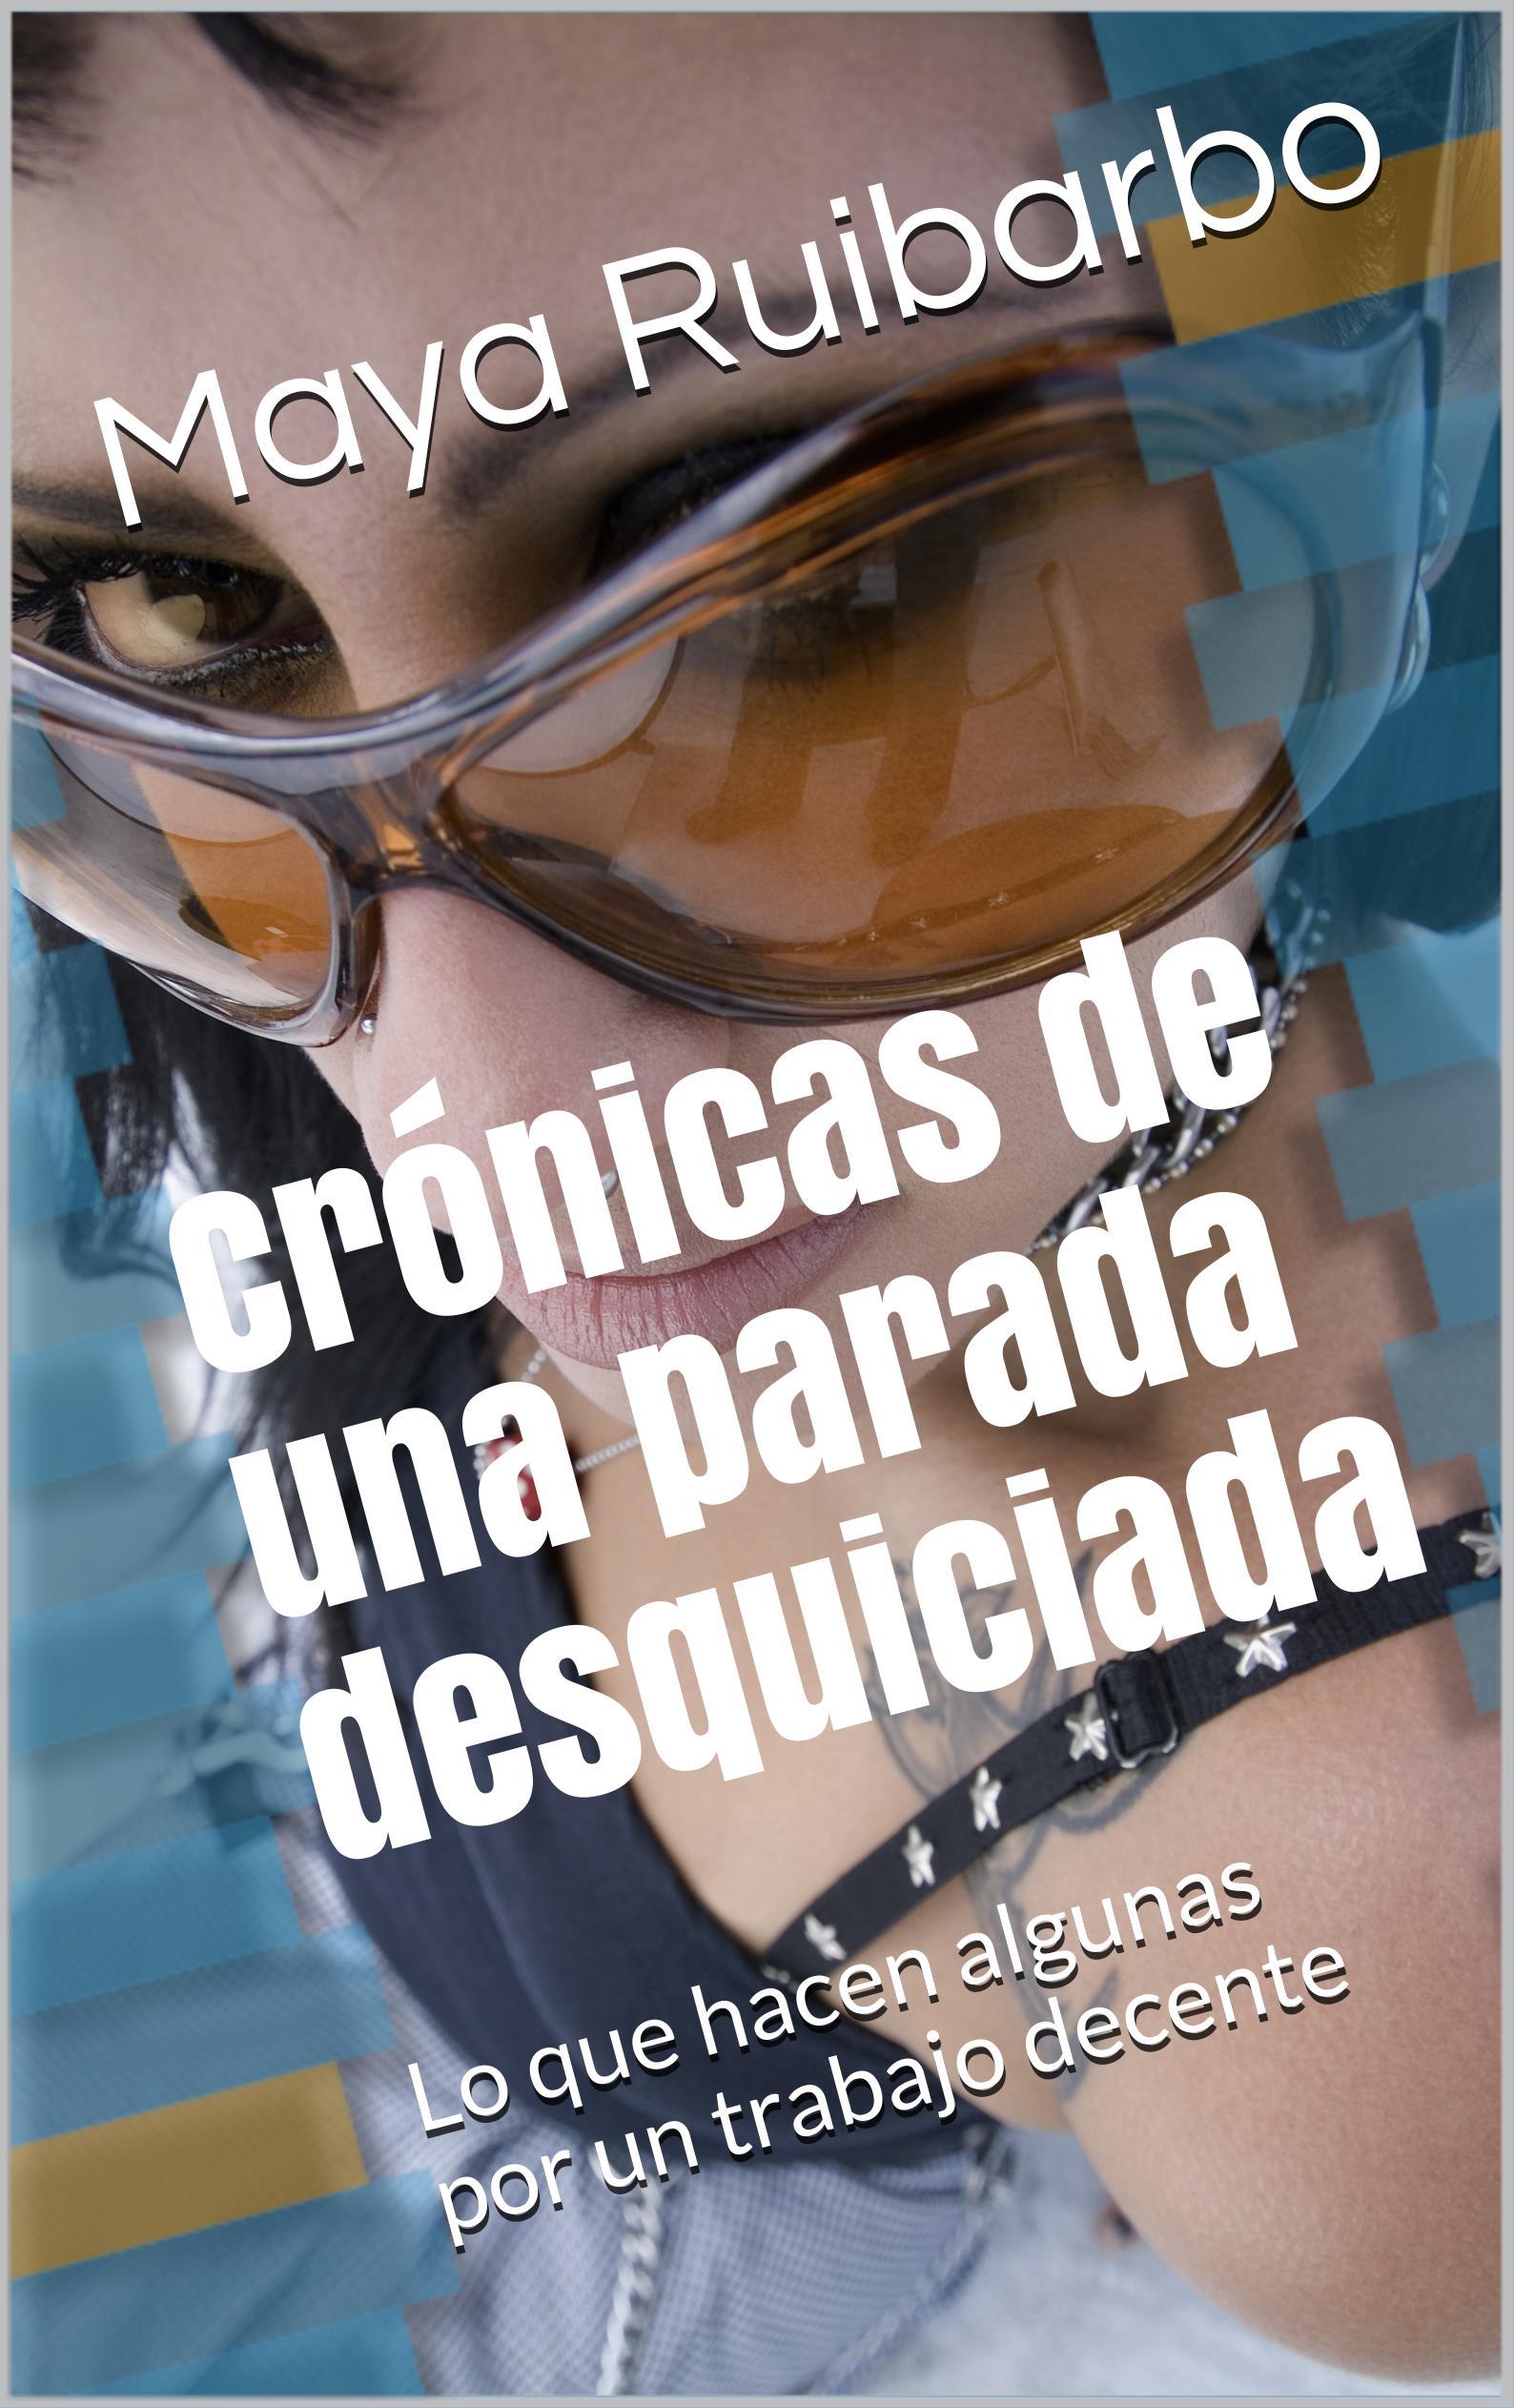 portadakindlecronicas1